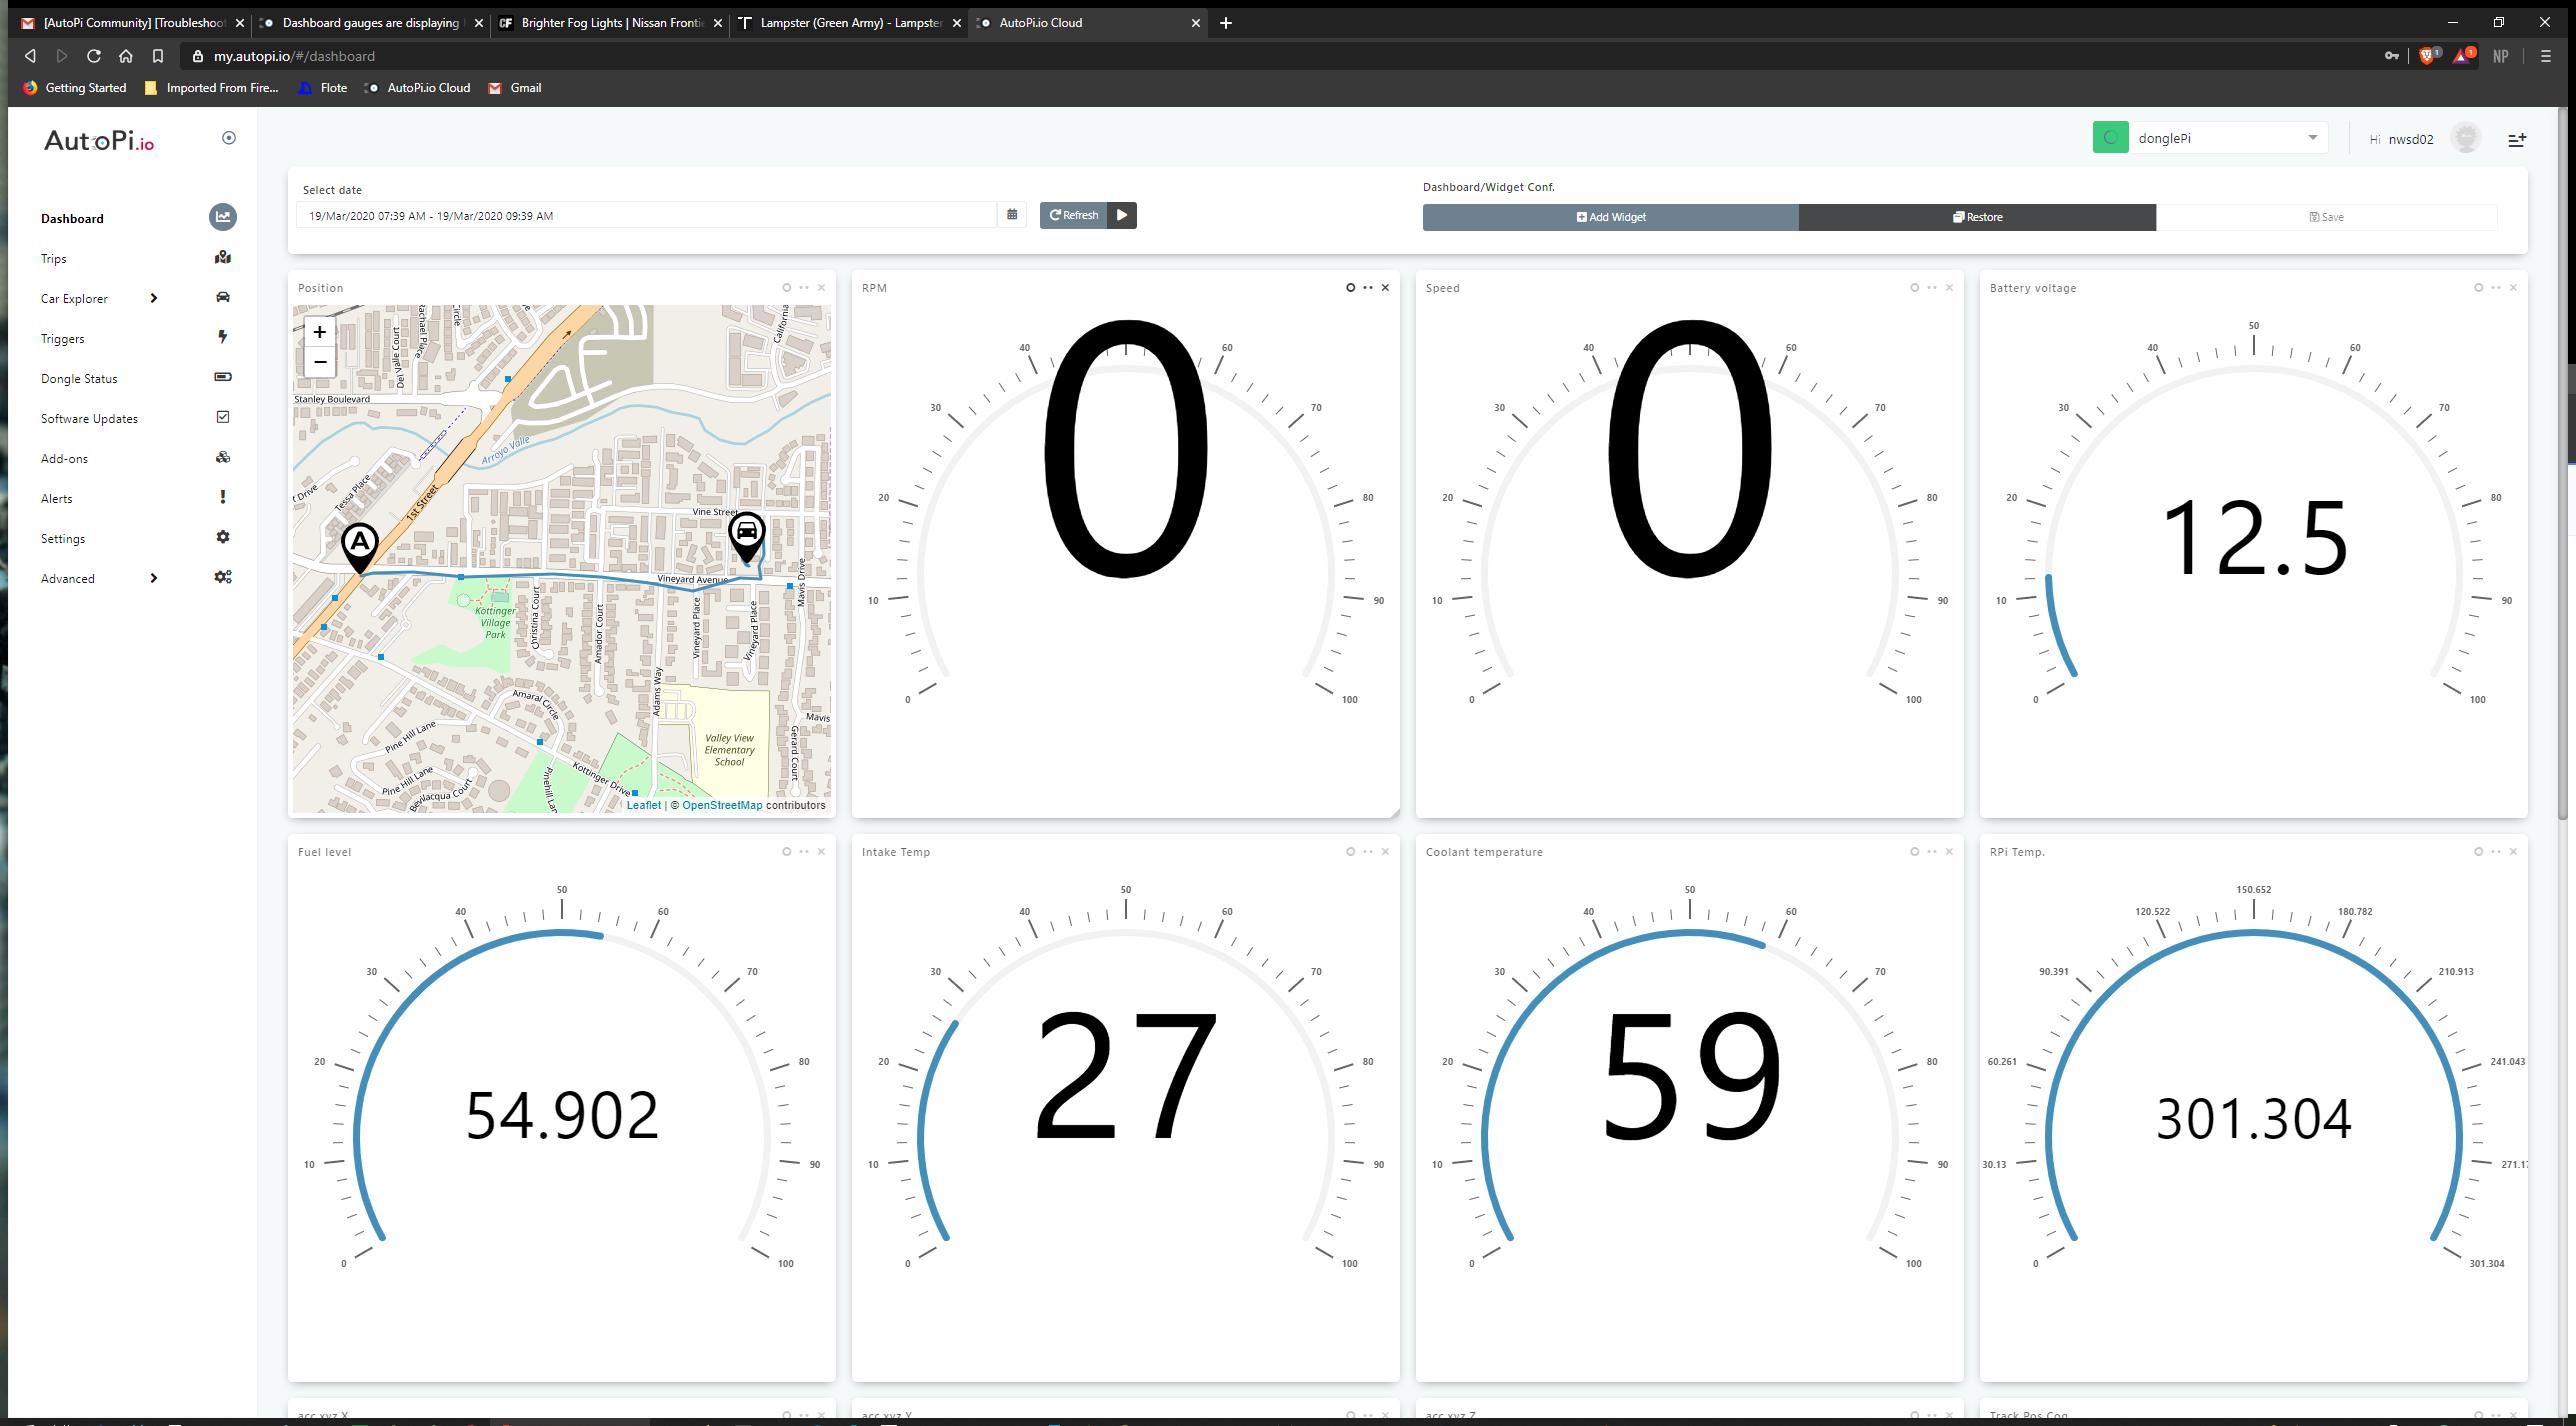 Screenshot 2020-03-19 09.39.30